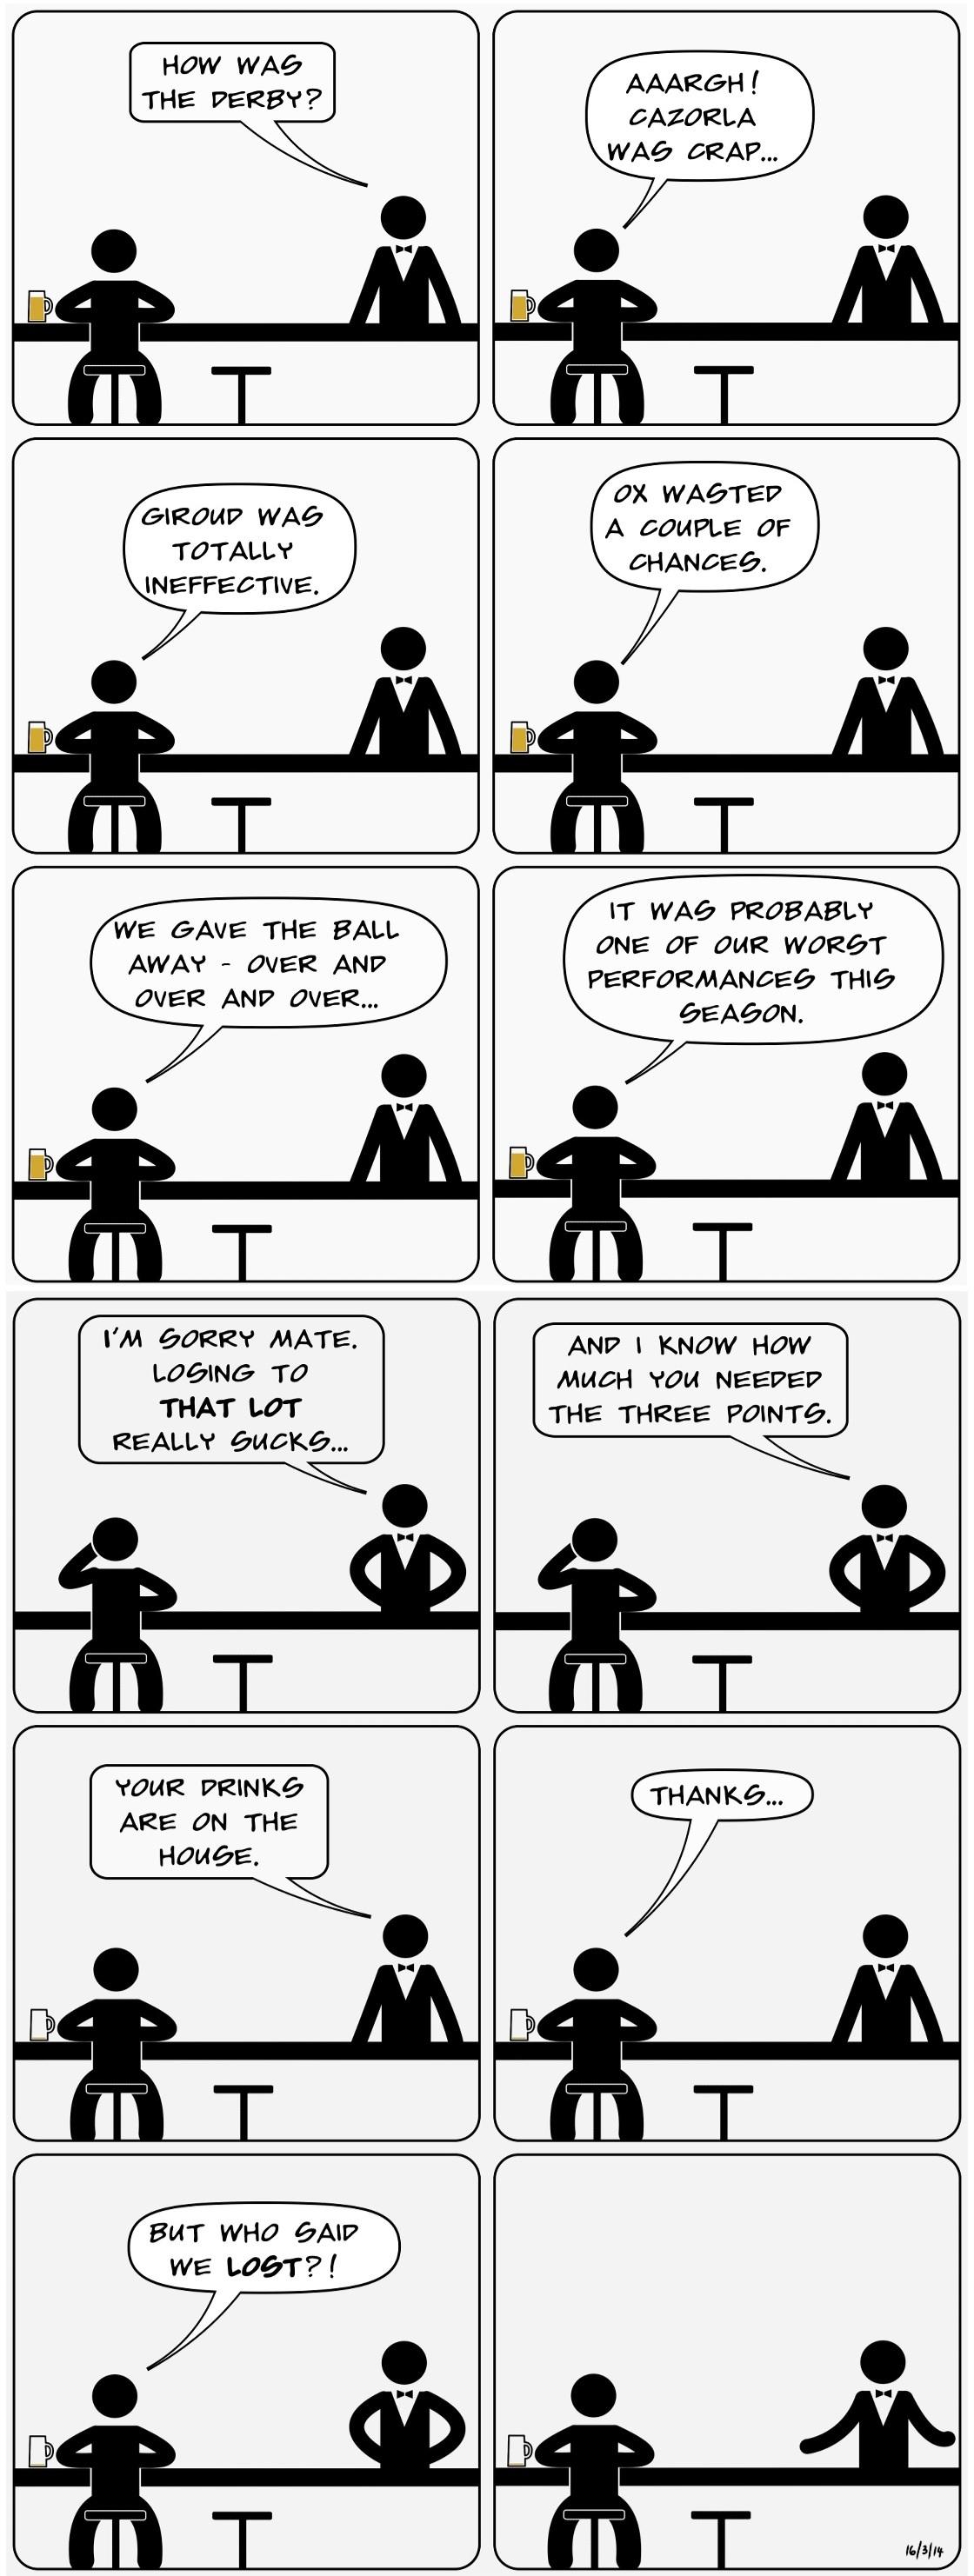 GOONBOGGLE An Arsenal comic by Batmandela 016 - NLD